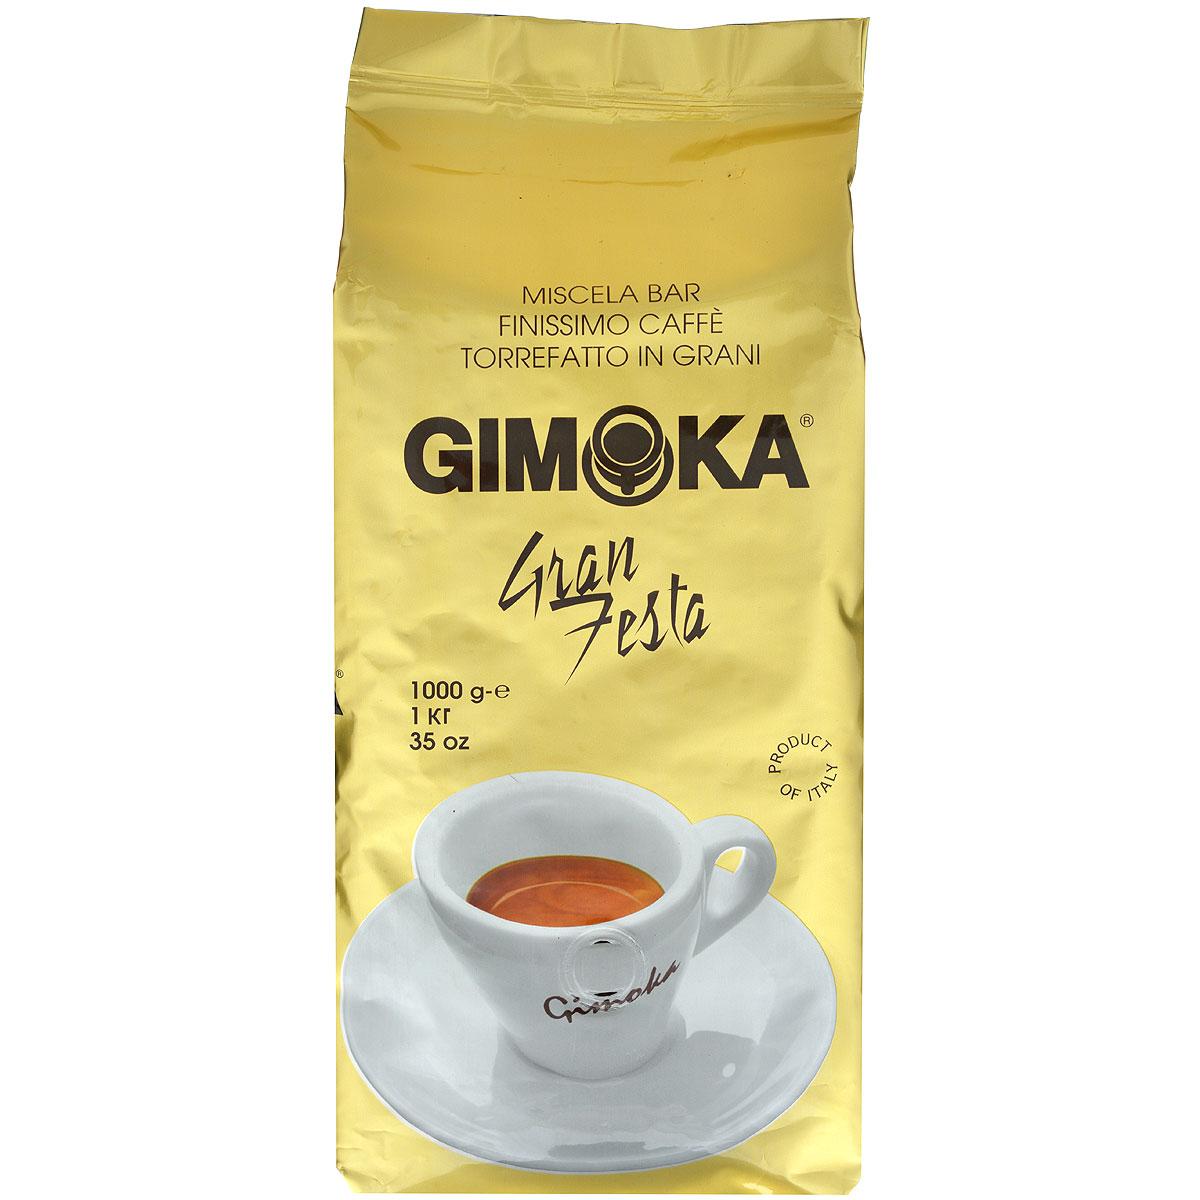 Gimoka Oro Gran Festa кофе в зернах, 1 кг8003012000046